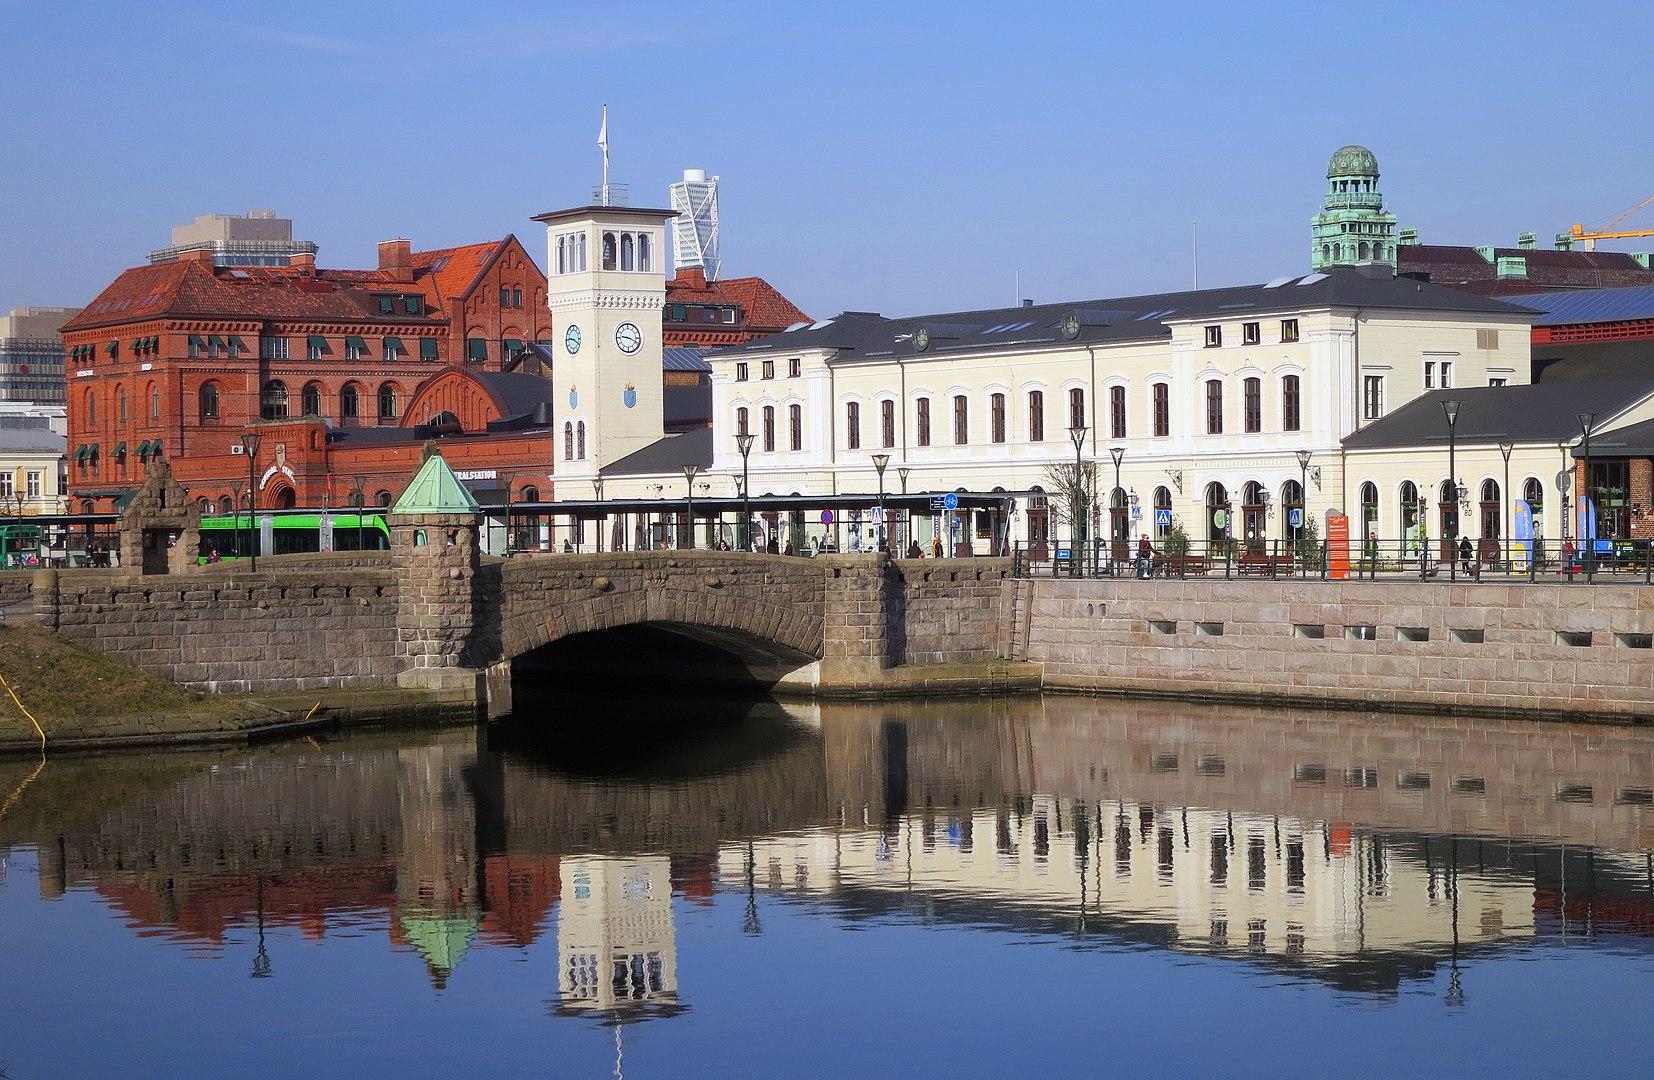 Malmö station